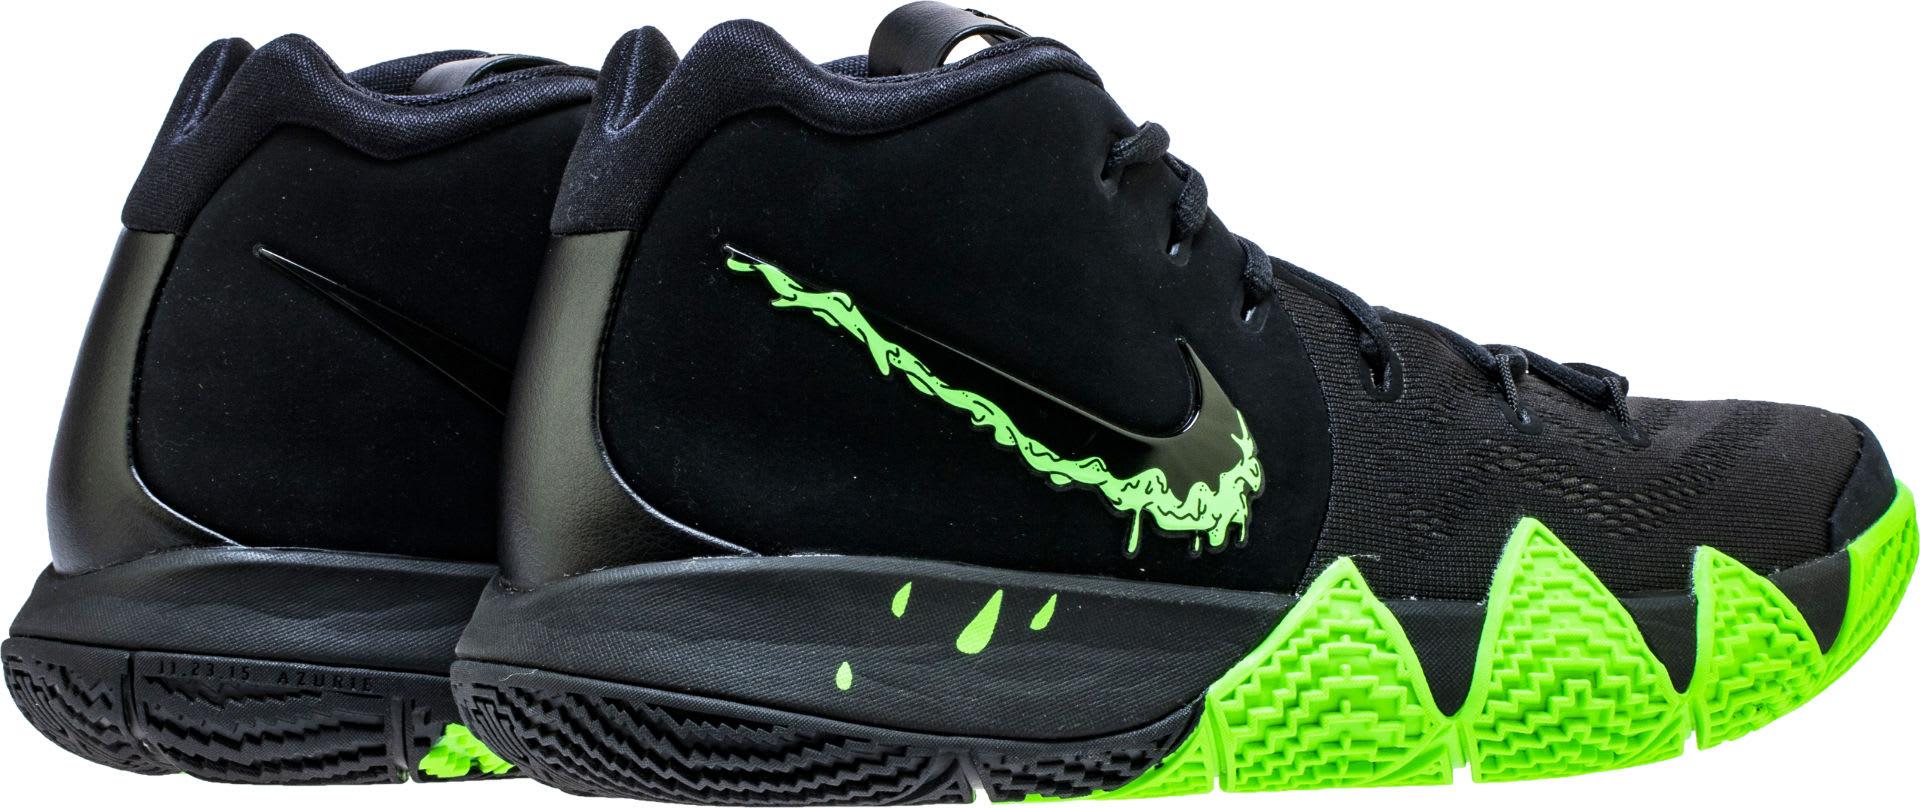 Kyrie Halloween Green Date 4 Rage Nike Release 943806 012 Black dXqwdnfv